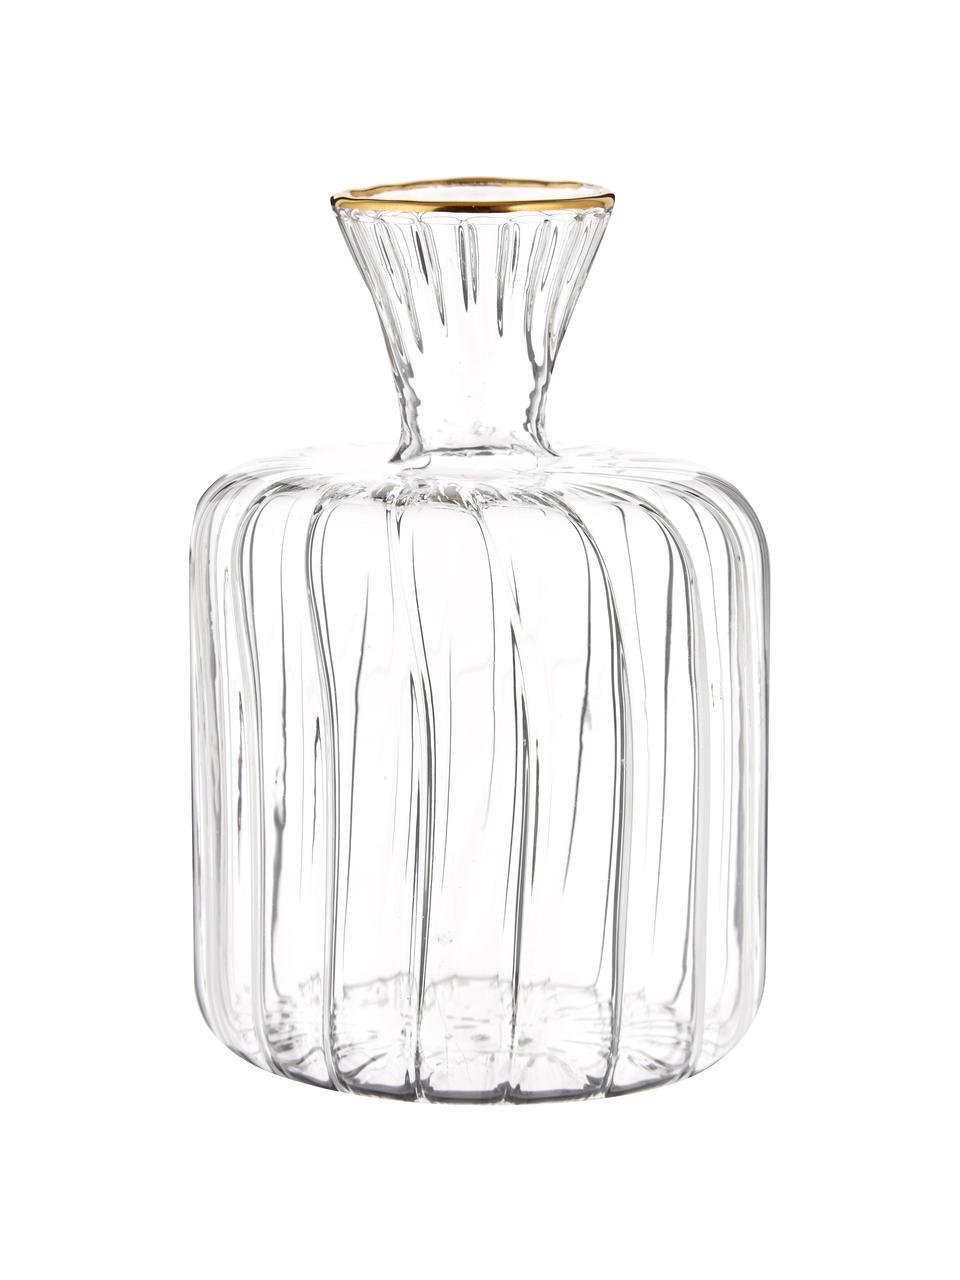 Kleine Glas-Vase Plinn, Glas, Transparent, Goldfarben, Ø 7 x H 10 cm